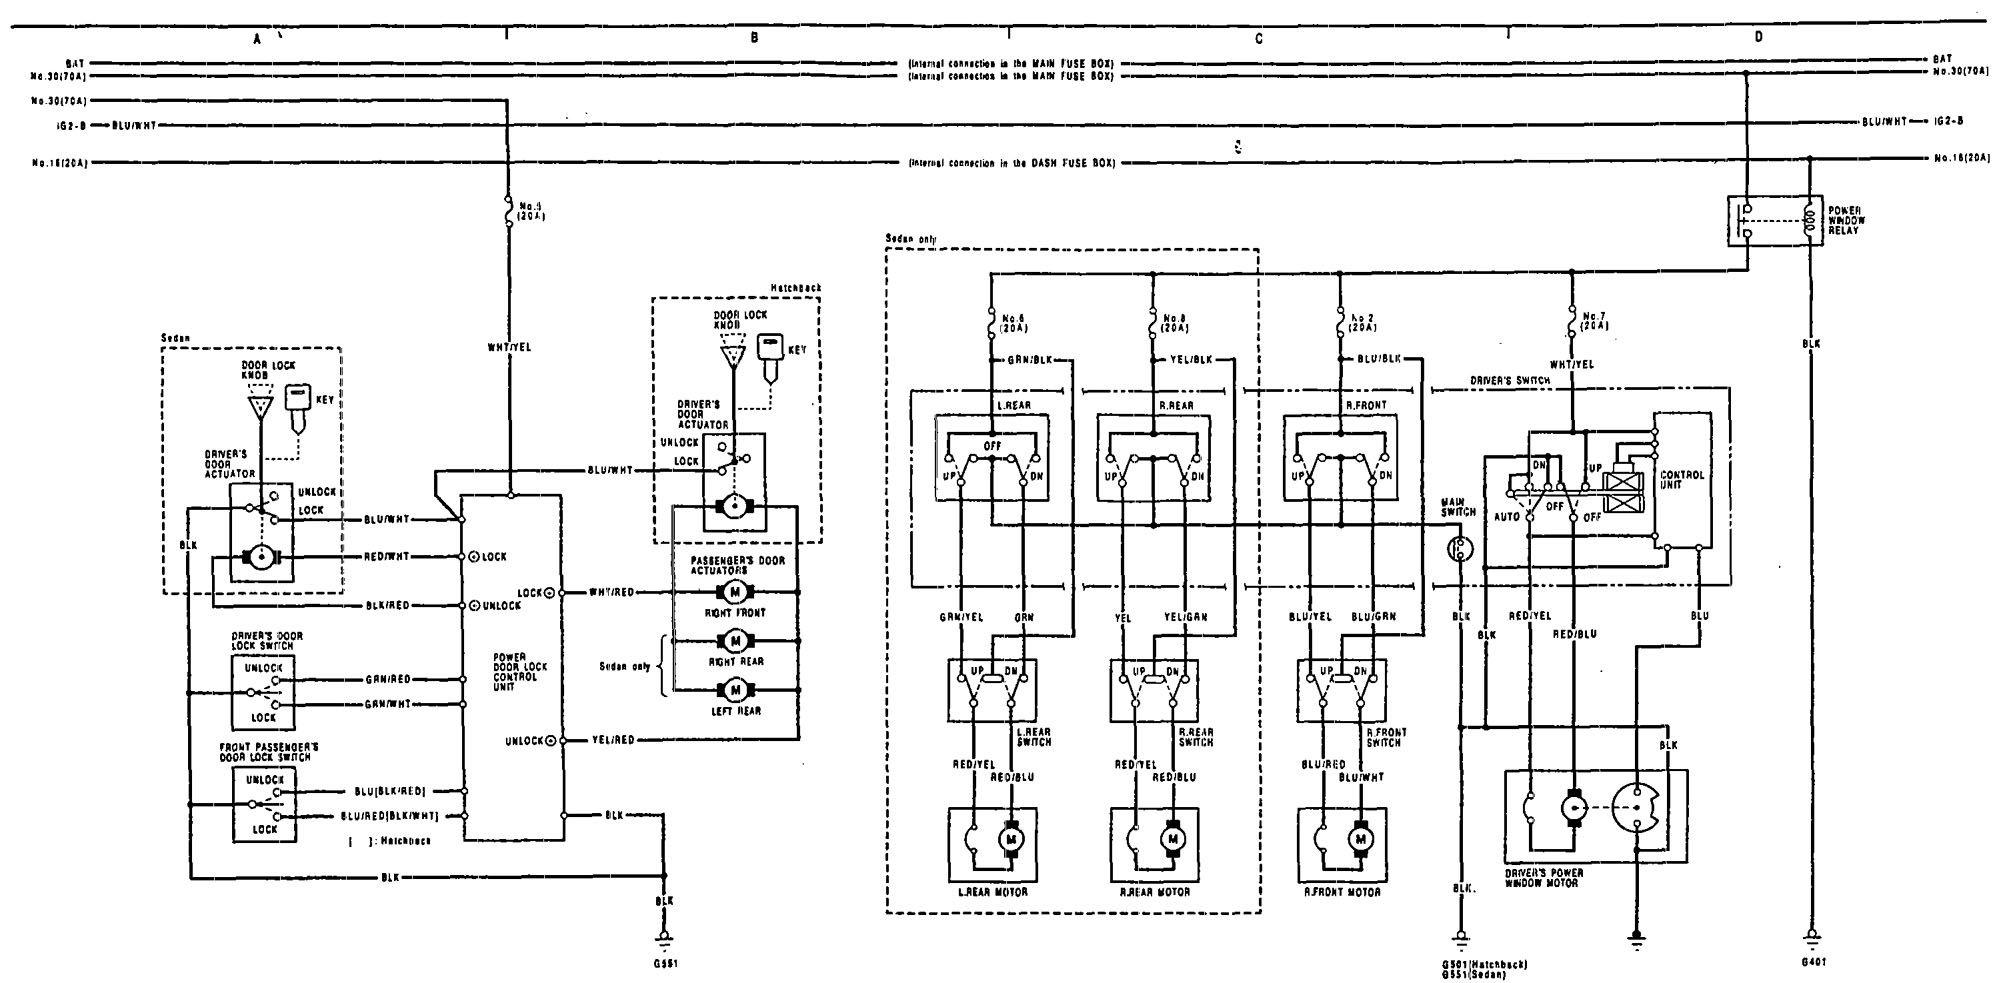 1996 acura integra speaker wiring diagram led trailer lights australia 1991 diagrams power windows